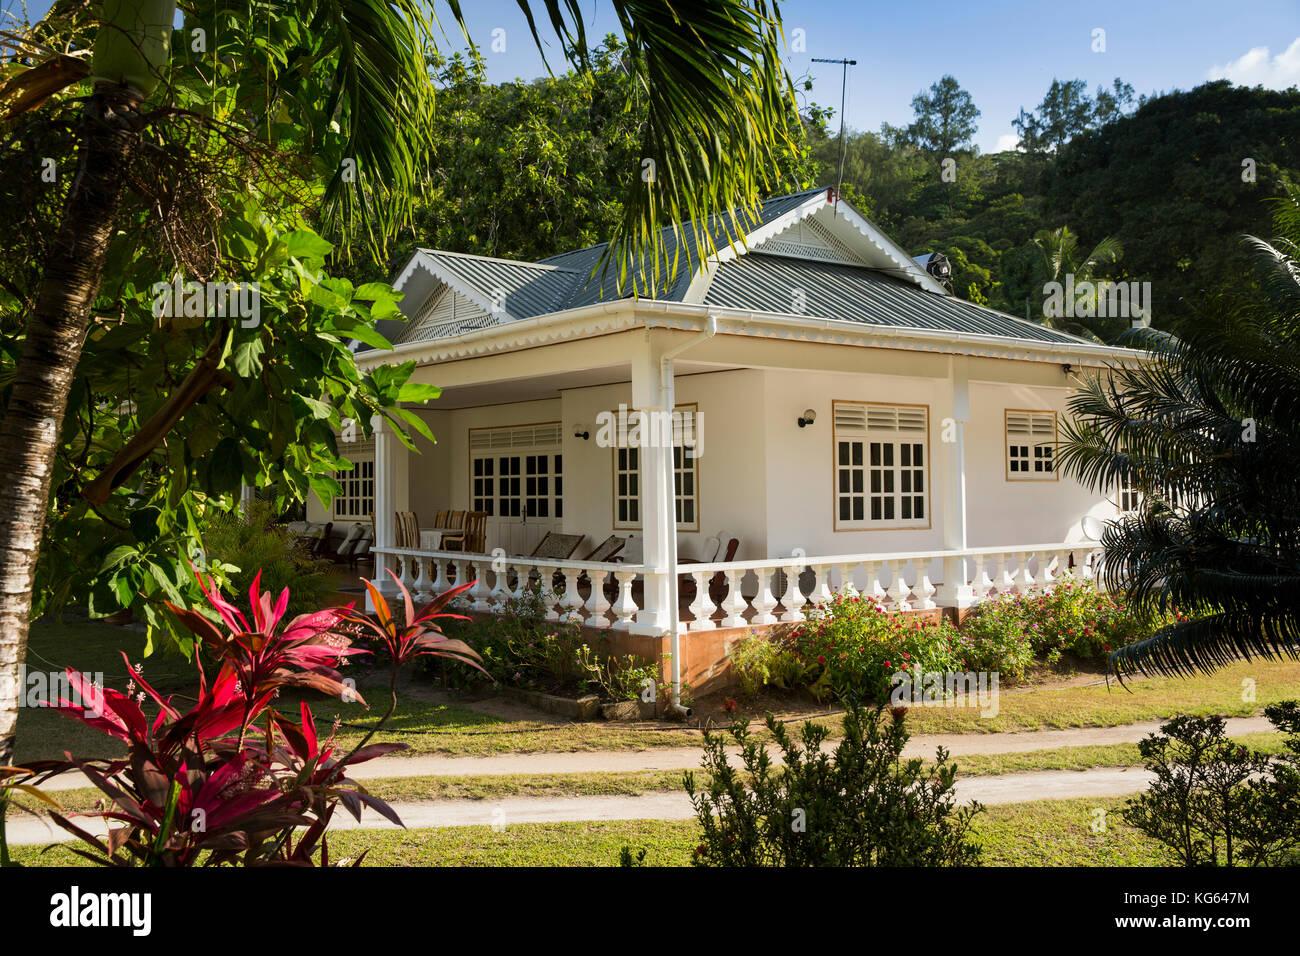 La seychelles praslin grand anse stile coloniale - Veranda in giardino ...